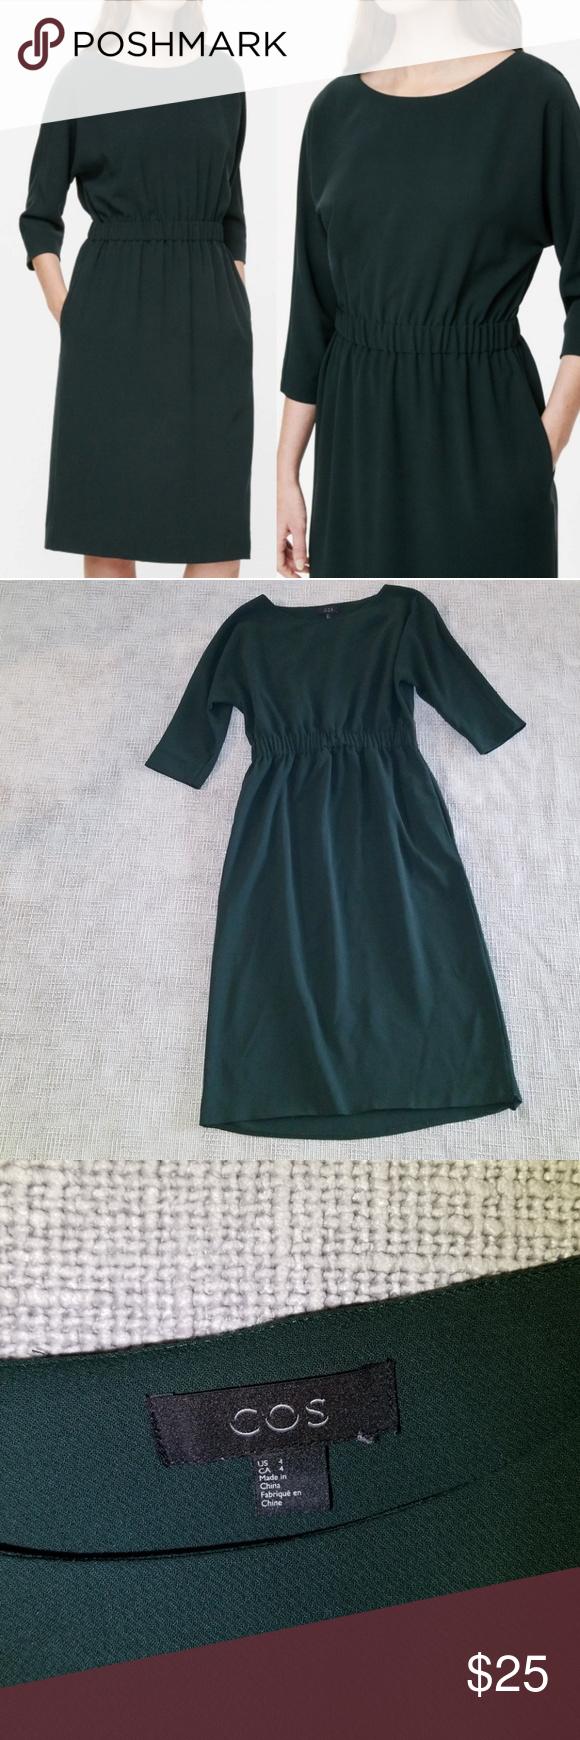 Cos green dress 2018  COS elastic waist dress hunter green COS elastic waist dress approx